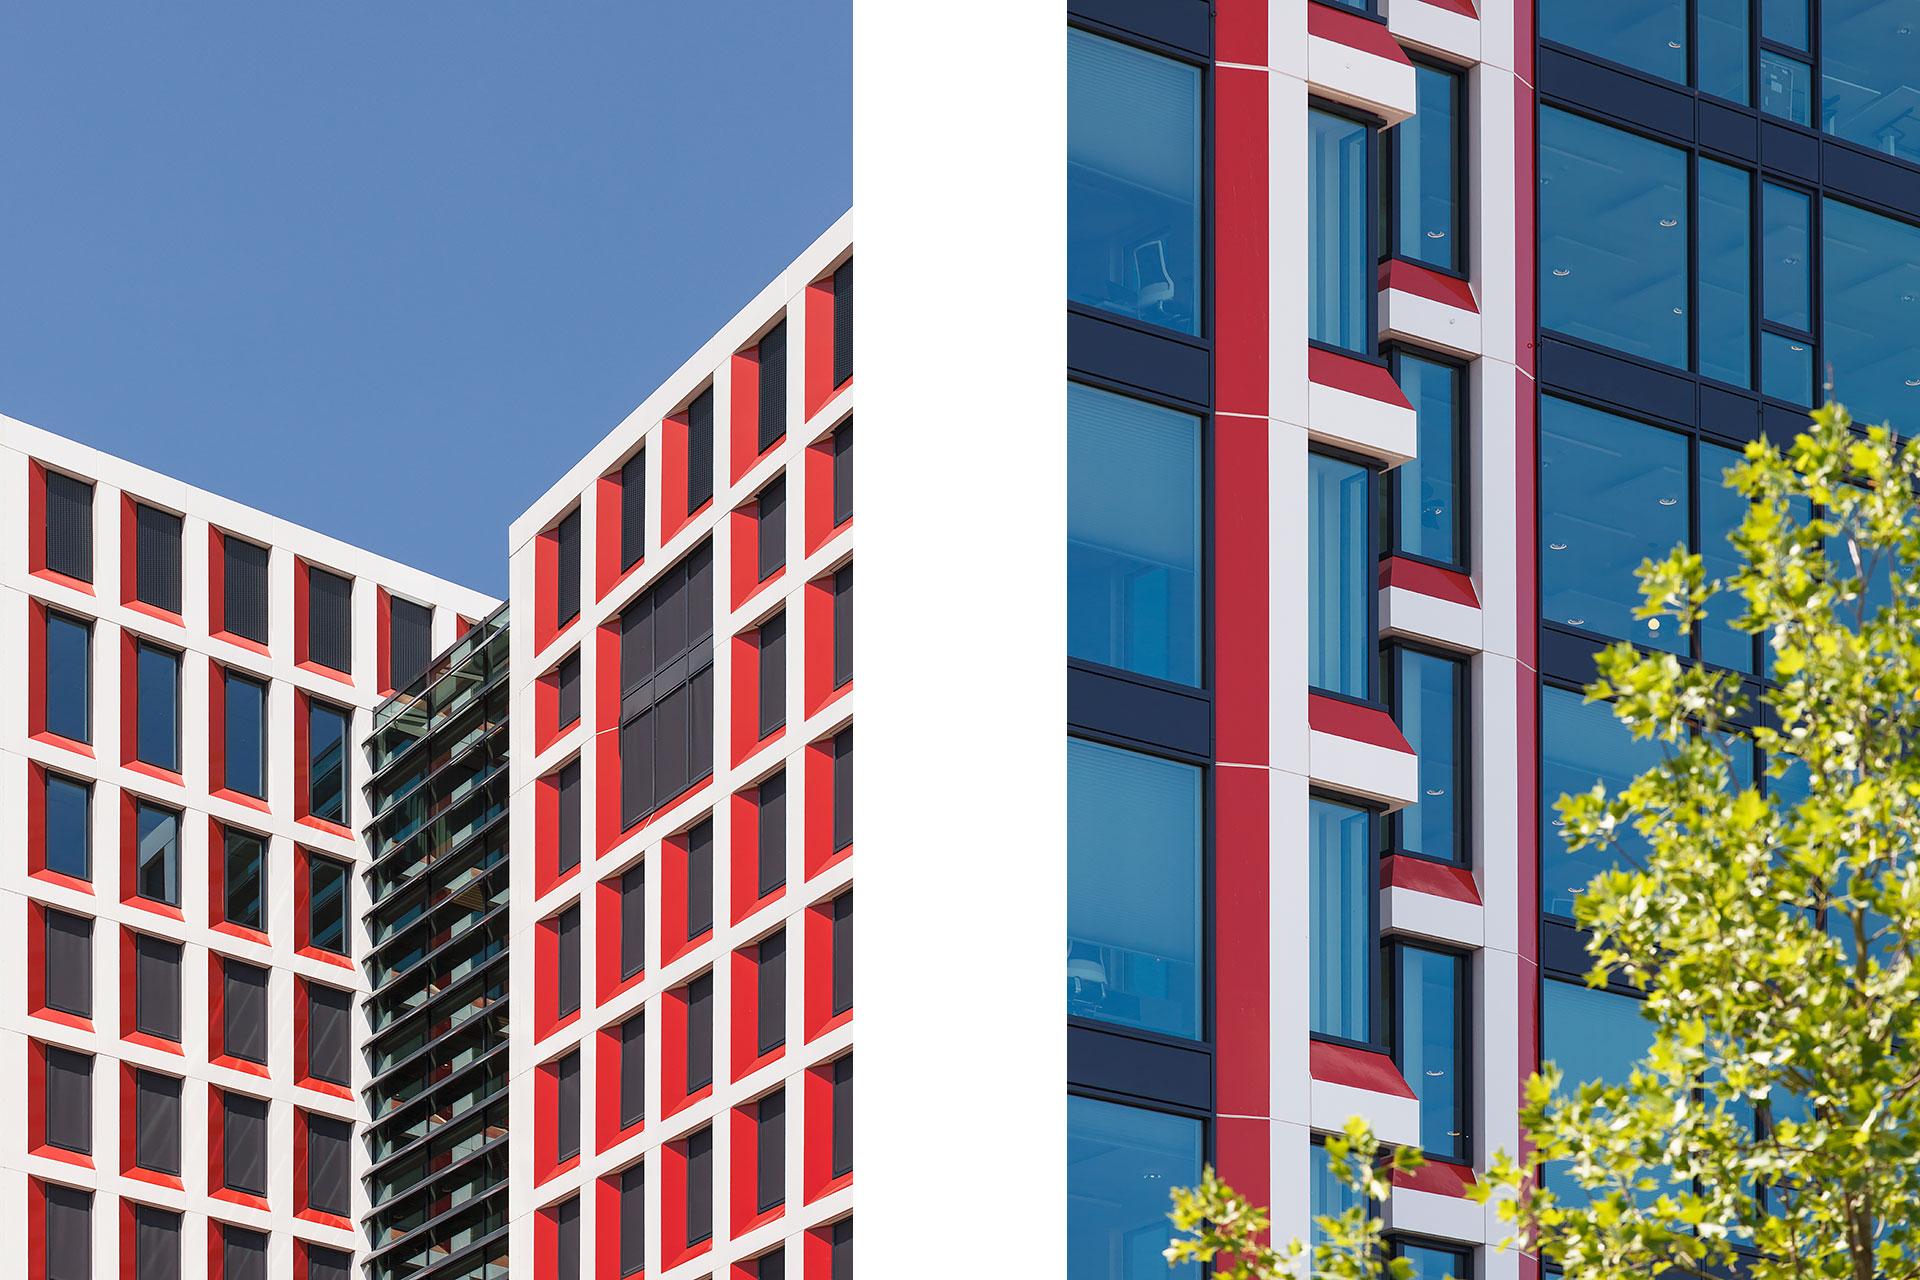 SP2015-Stadhuis-Almelo-architectuurfoto-09